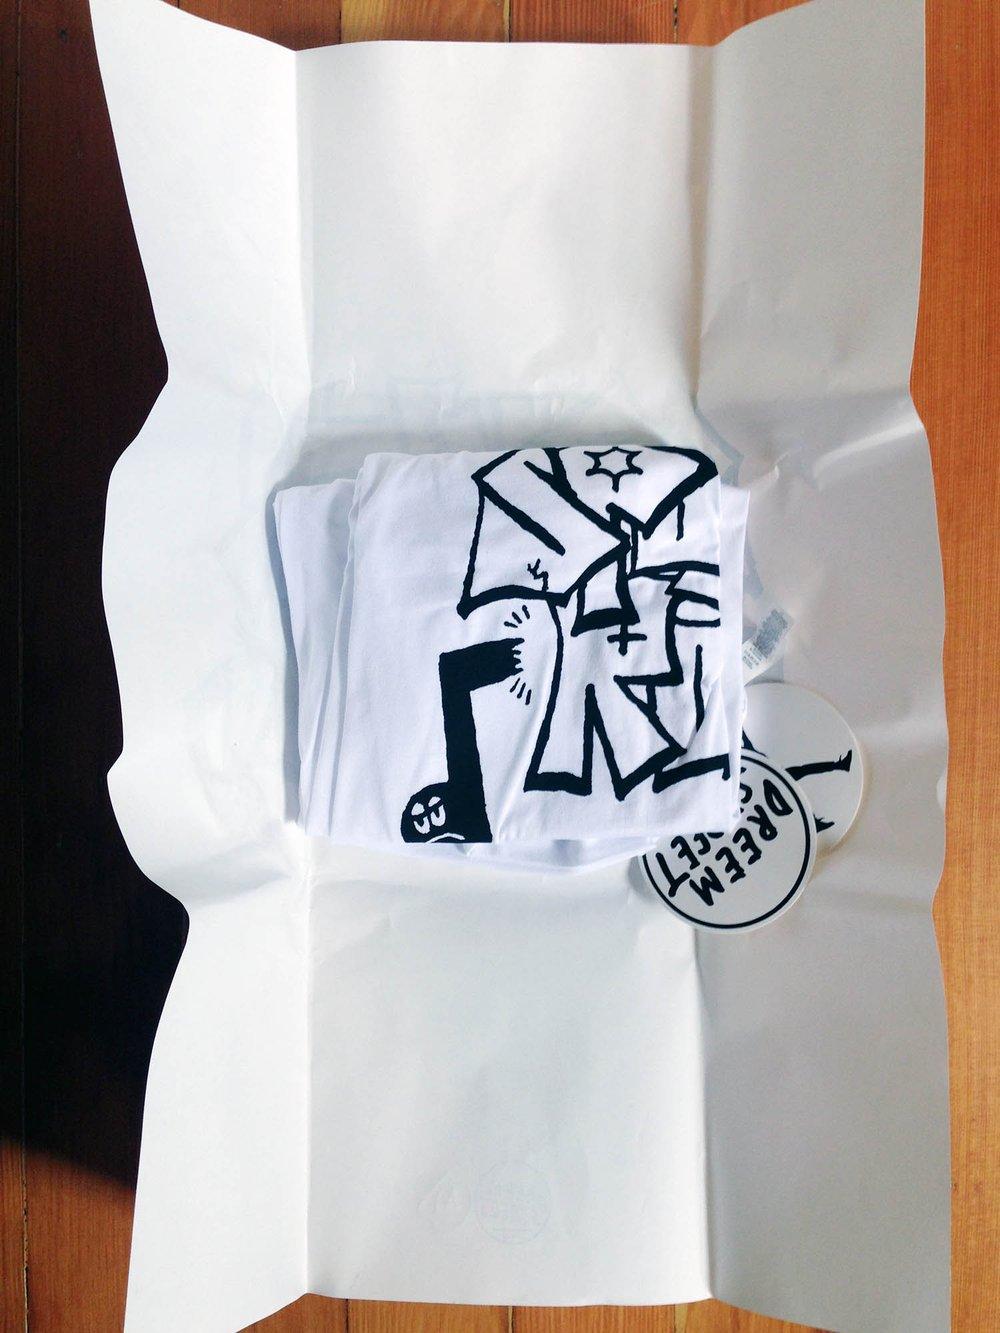 Spoiler Room T-shirt